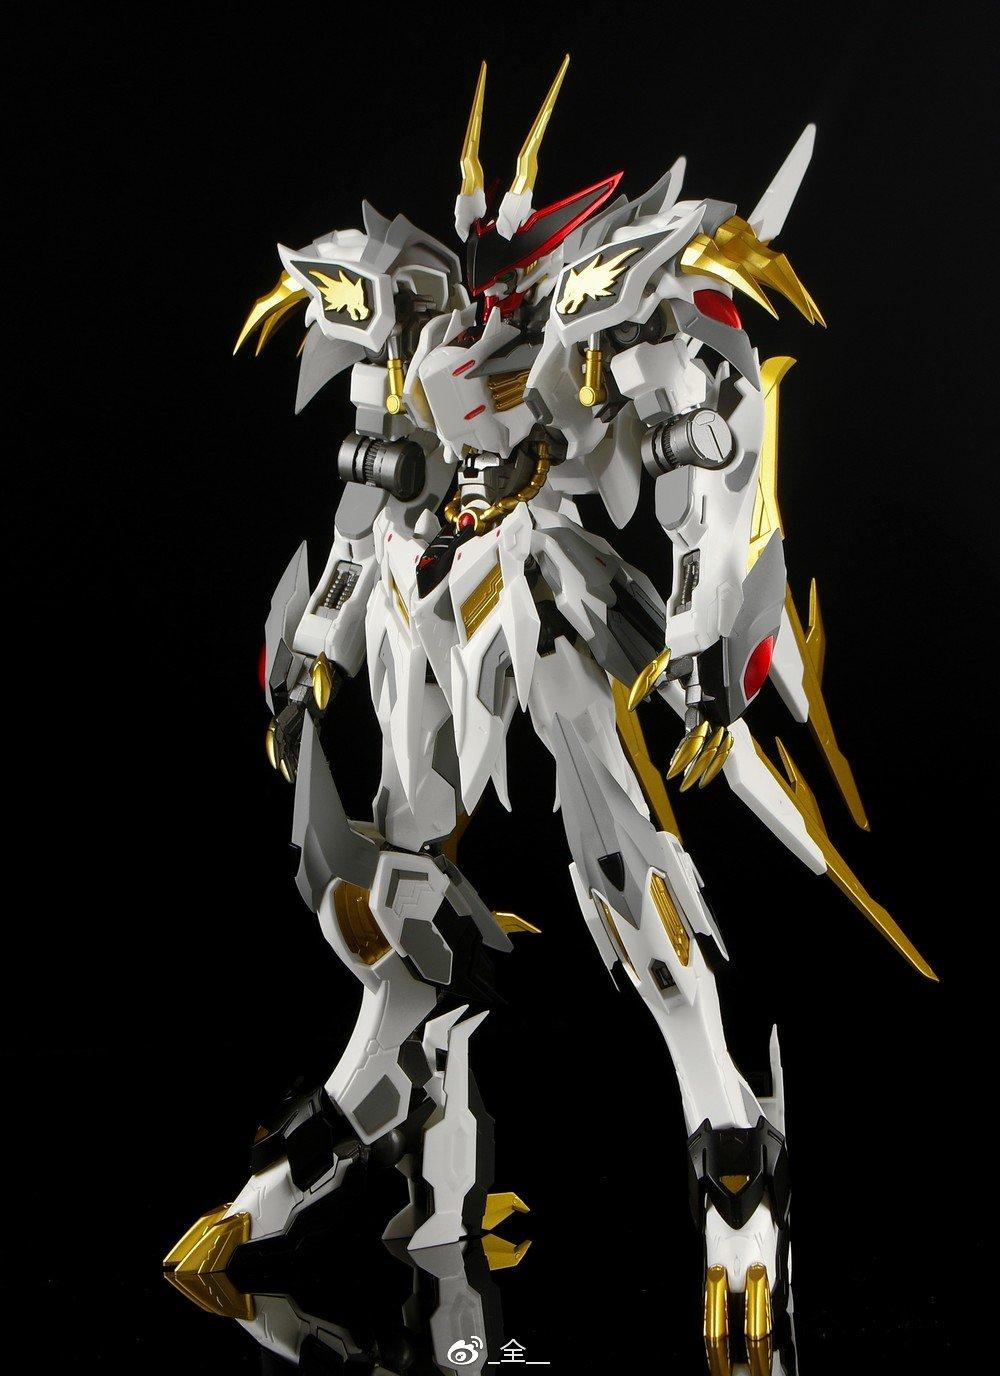 S279_MetalMyth_ryuou_inask_010.jpg